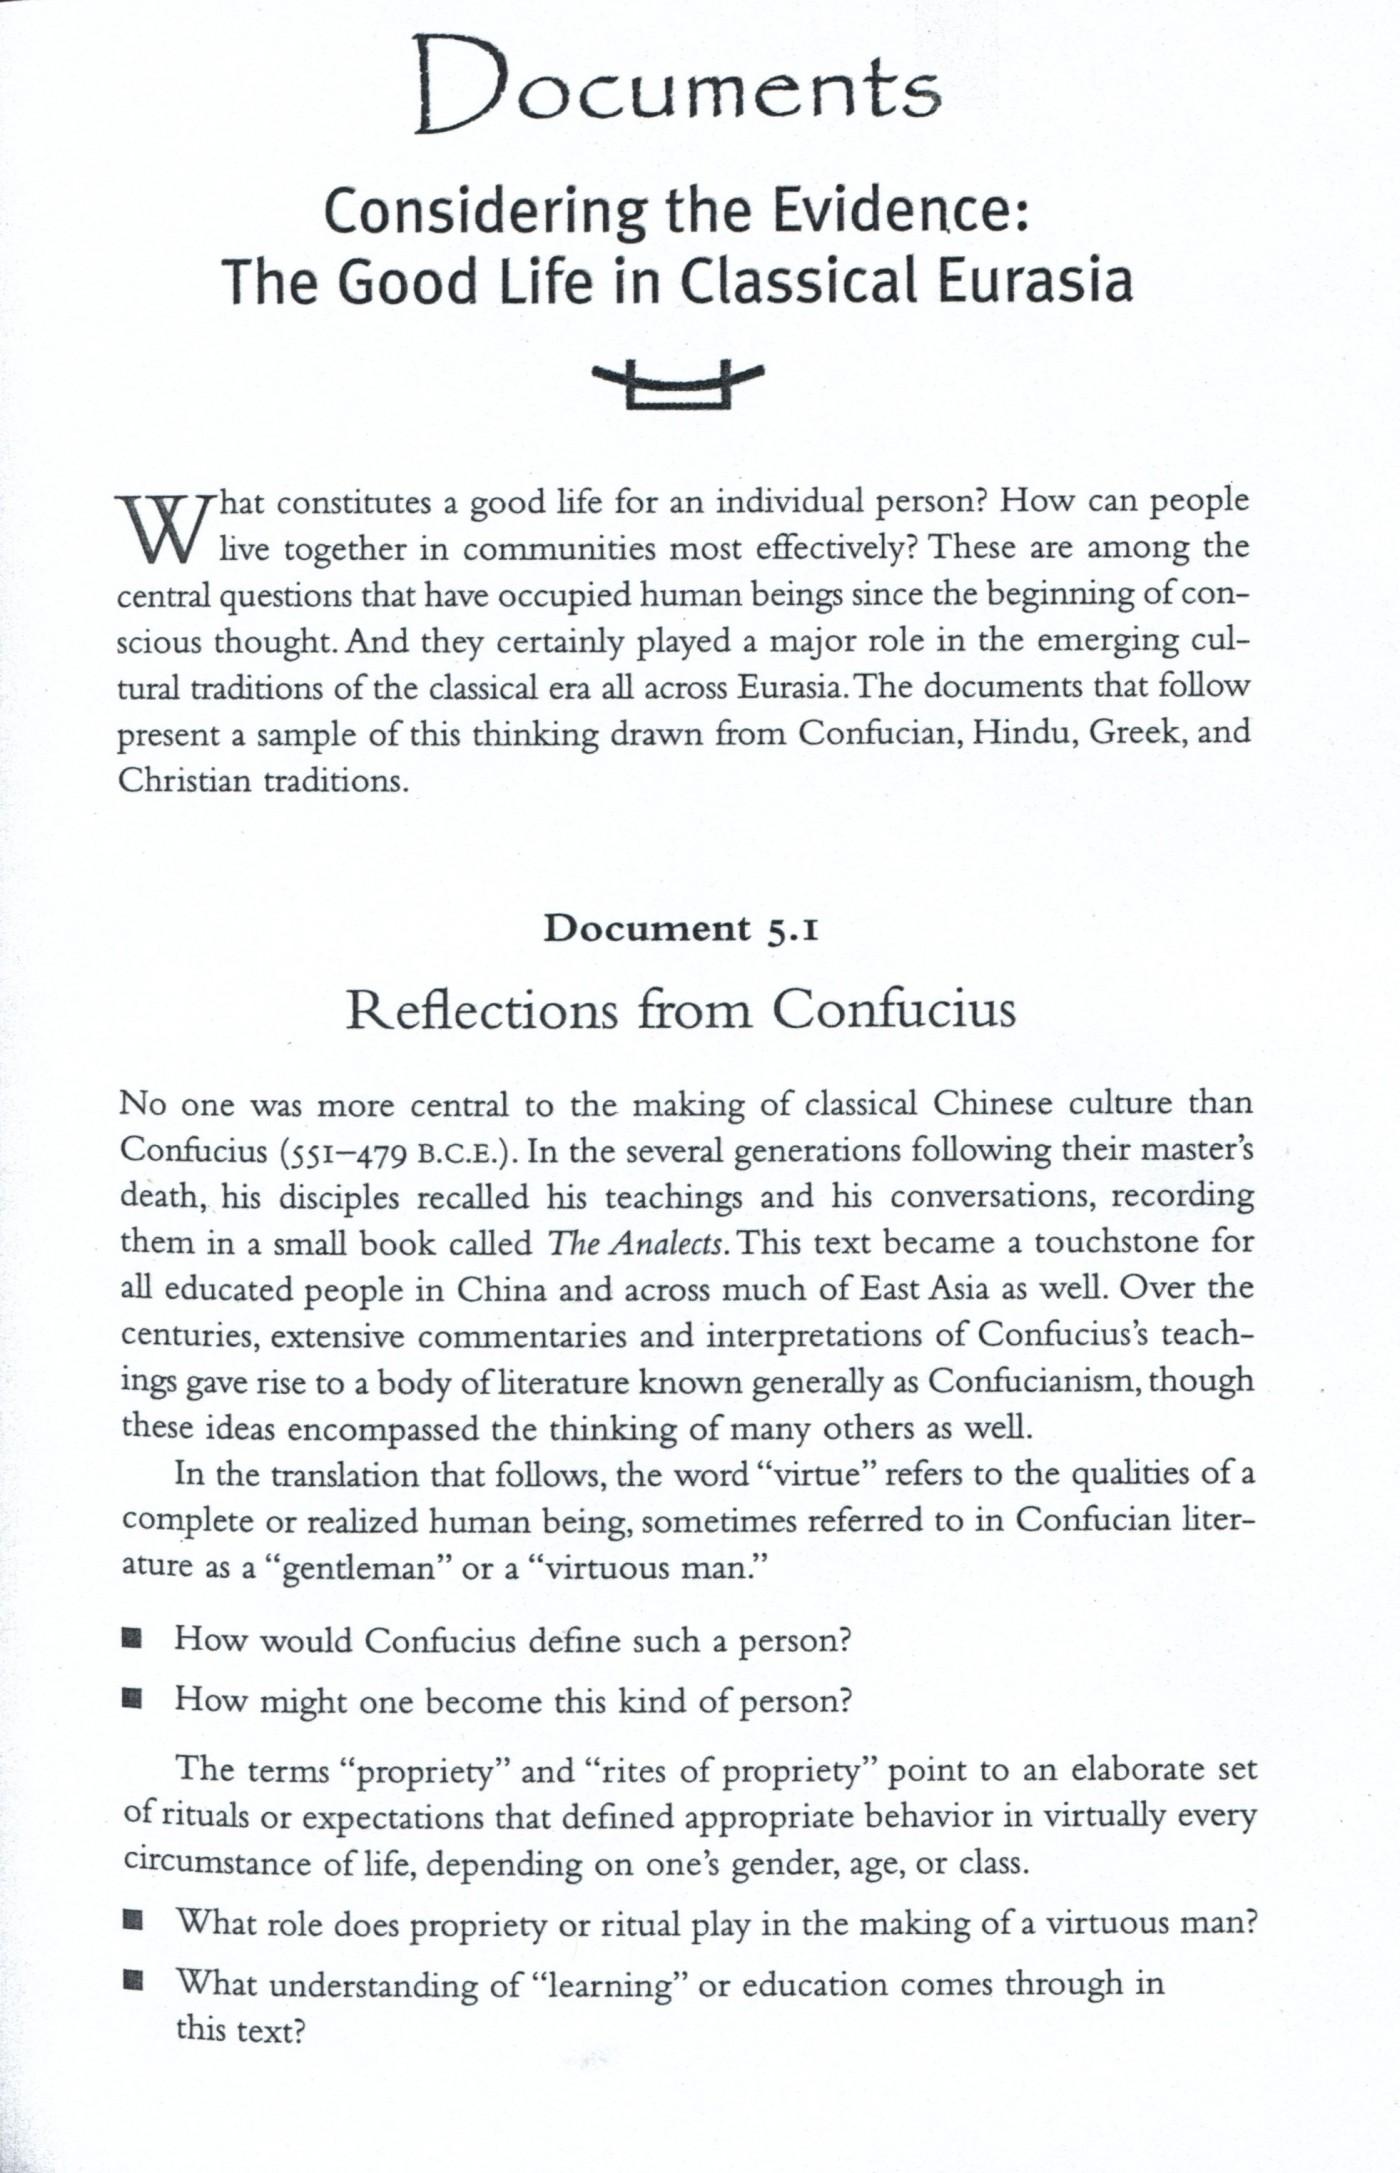 War of the worlds essay help